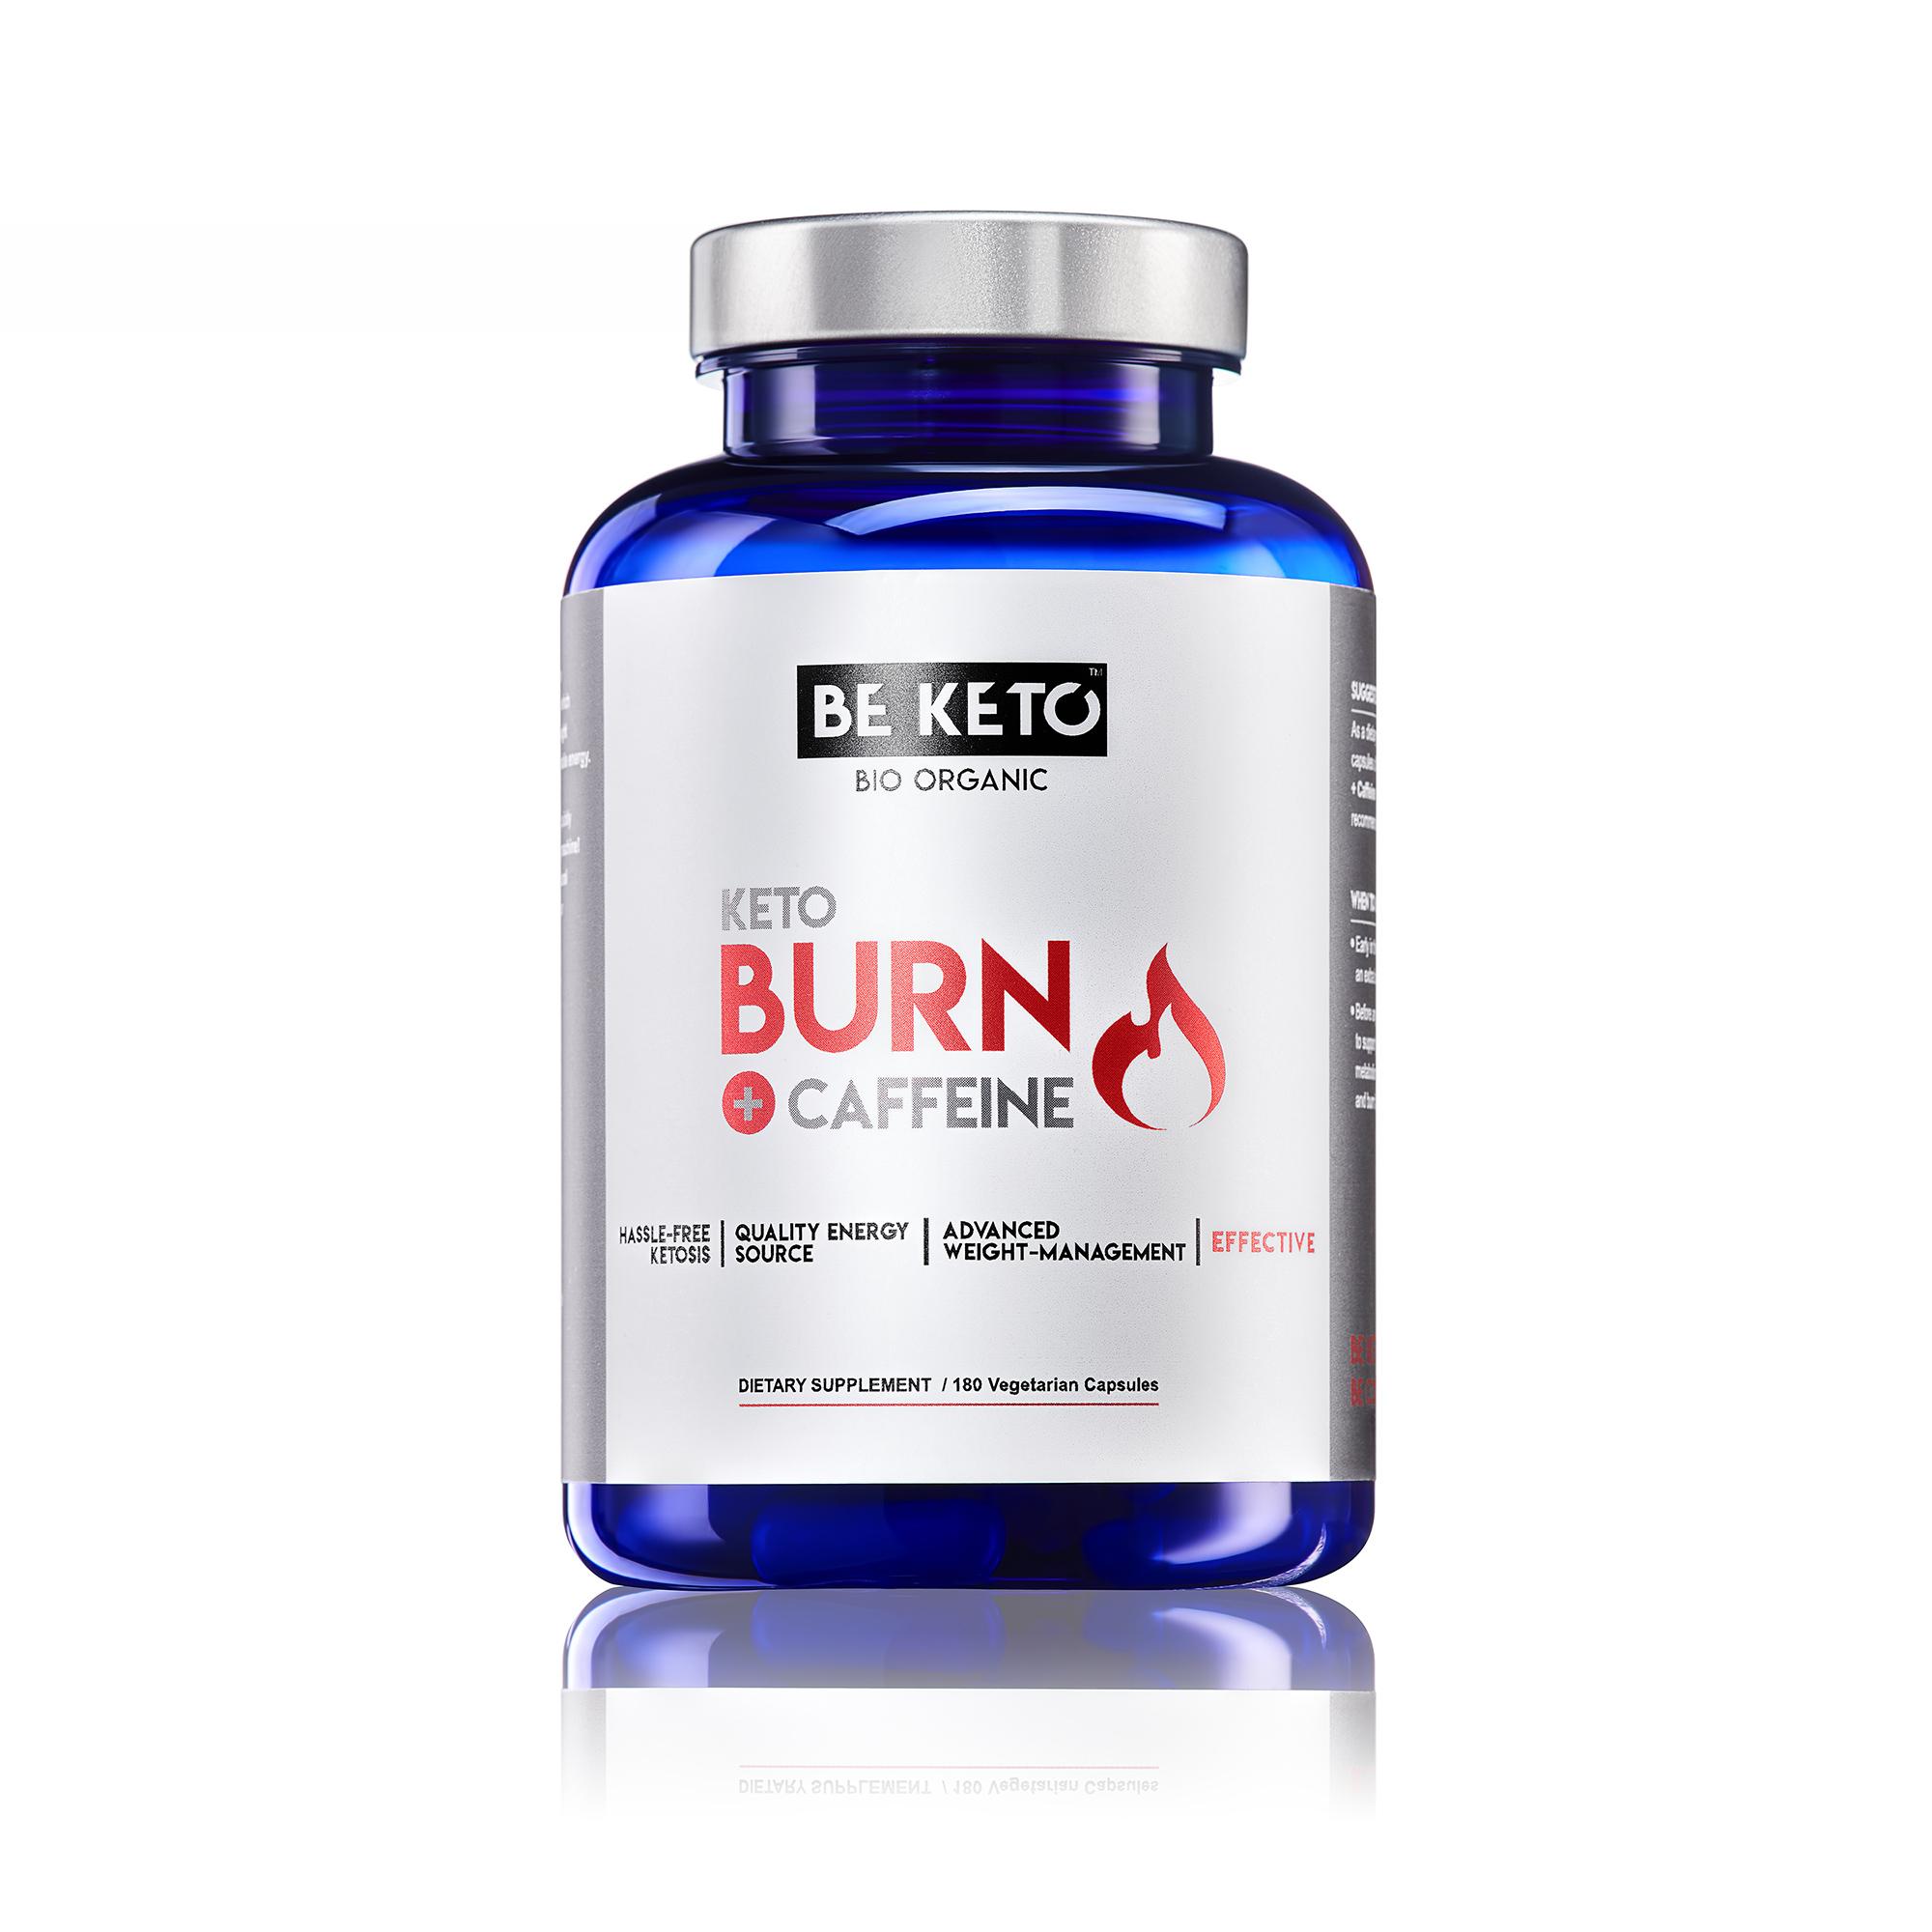 Keto Burn + Caffeine